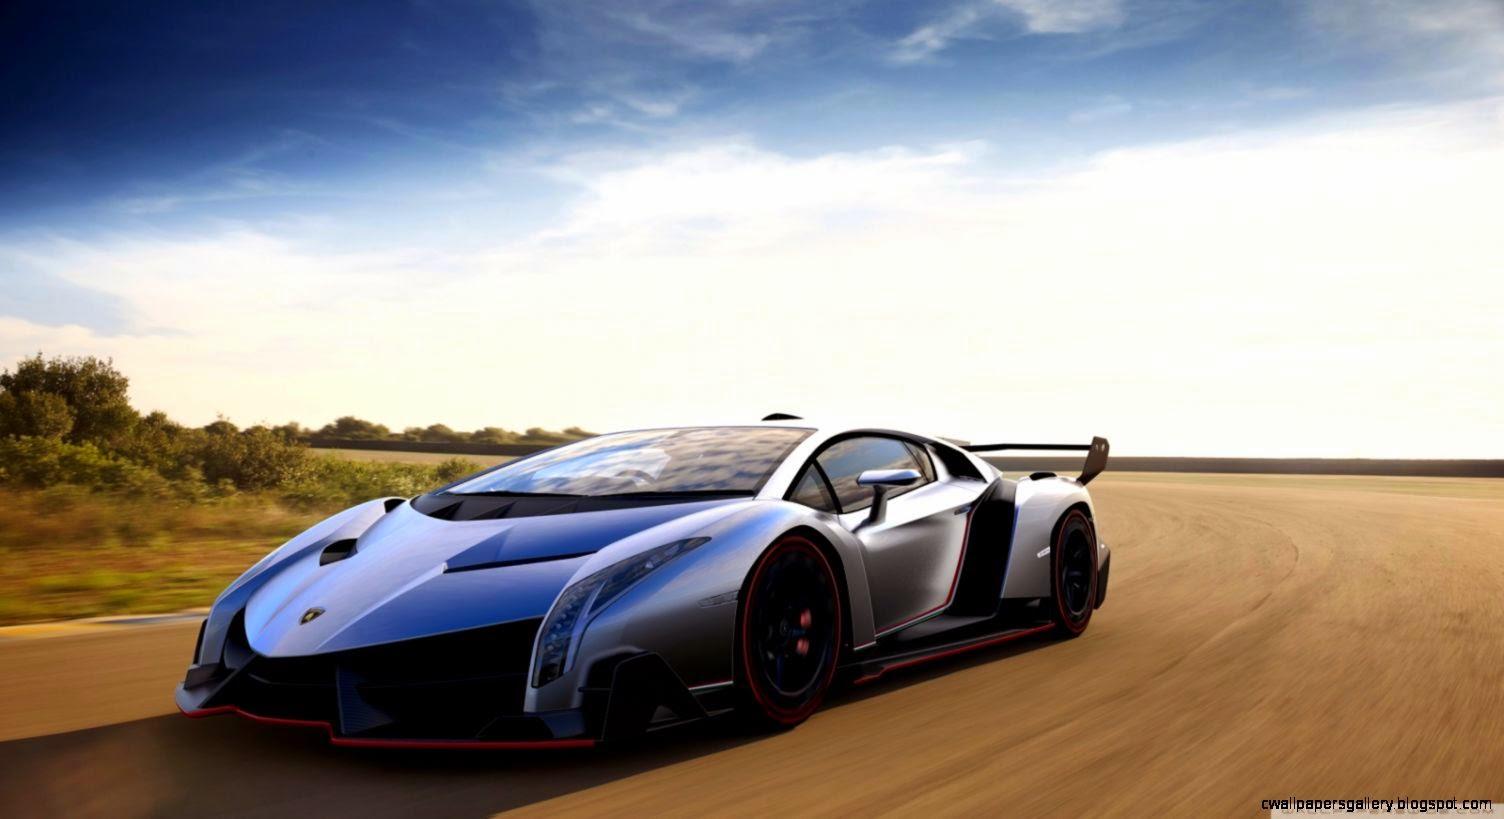 Lamborghini Veneno Wallpaper Hd | Wallpapers Gallery